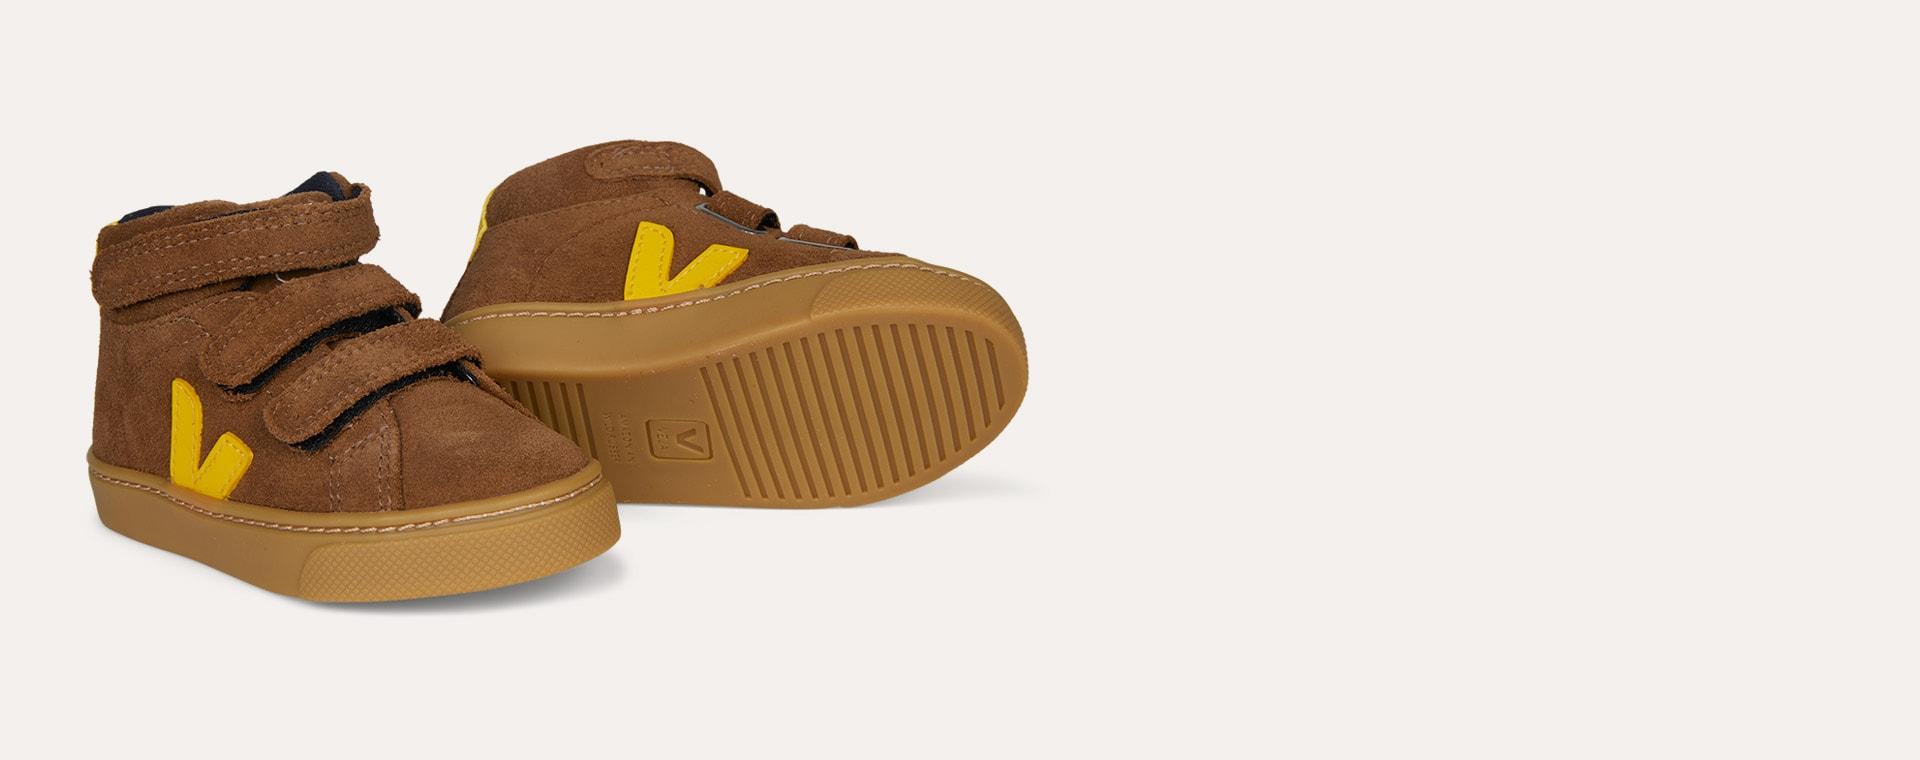 Brown Tonic Veja Esplar Mid Small Velcro Trainer